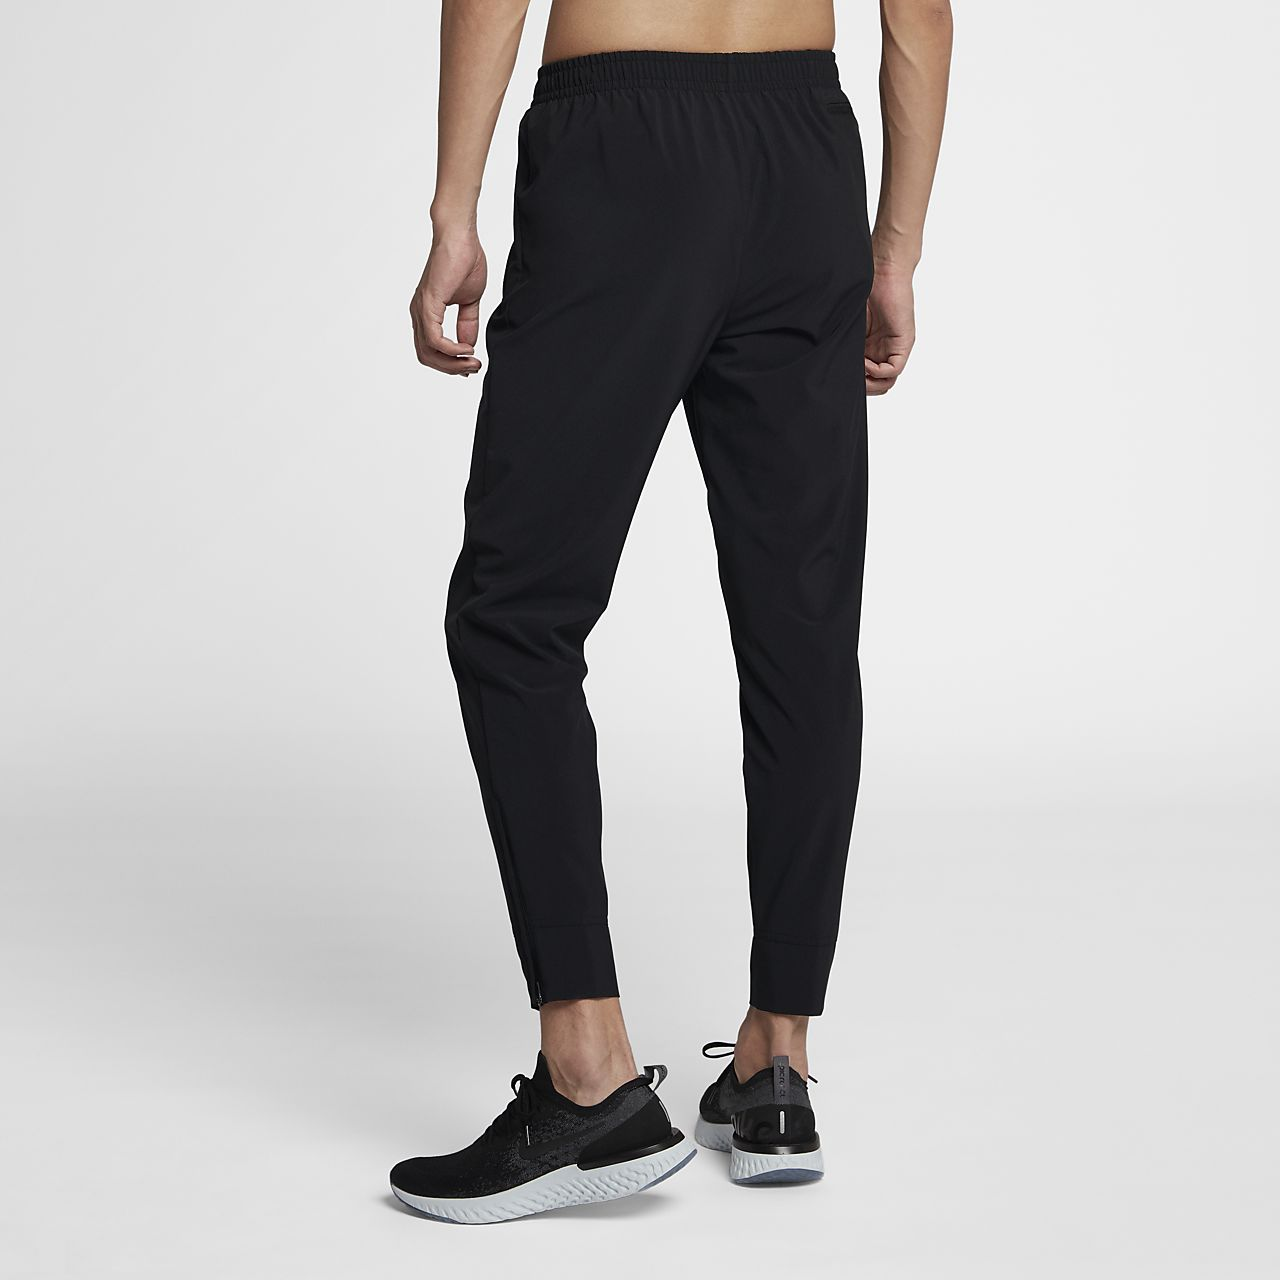 a7e577d7c4 Low Resolution Nike Essential szőtt férfi futónadrág Nike Essential szőtt  férfi futónadrág